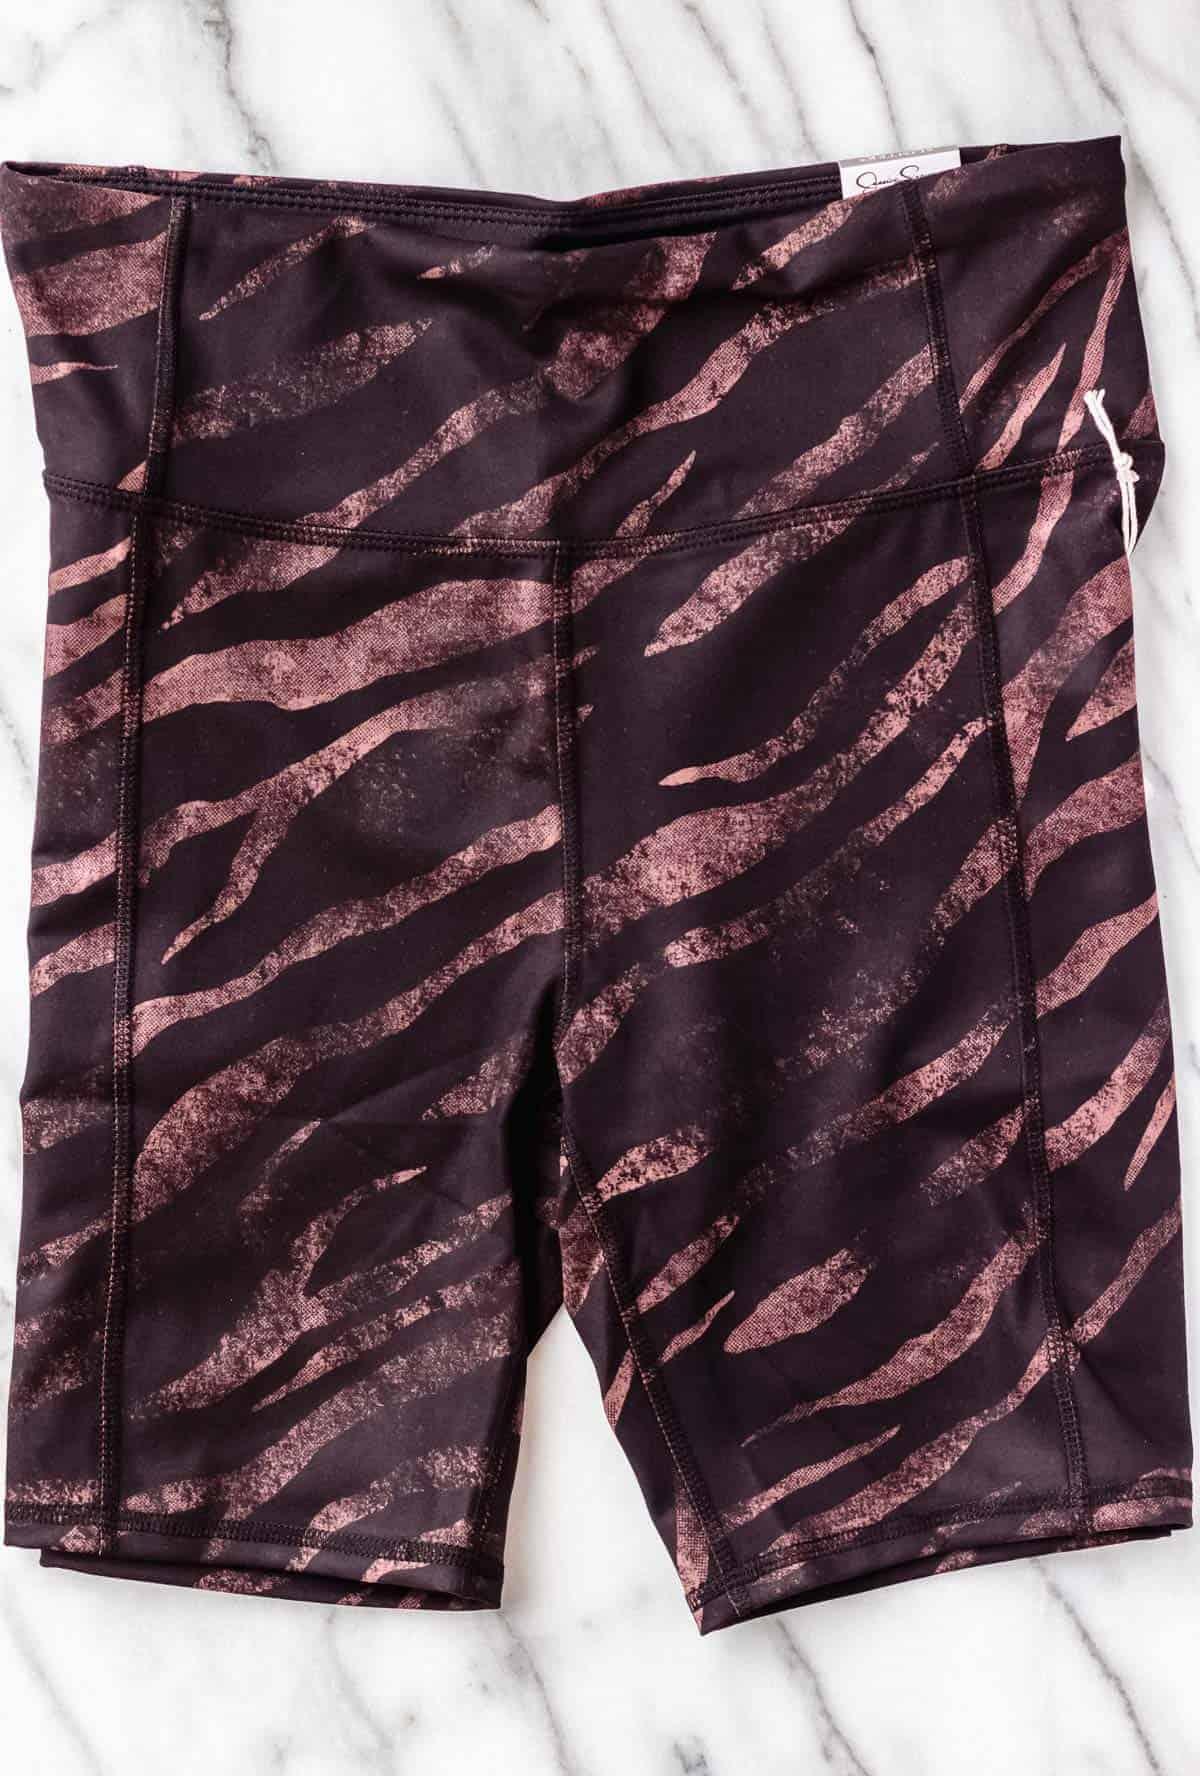 Jessica Simpson Tummy Control Bermuda Shorts in Black Mystic Zebra on a marble background